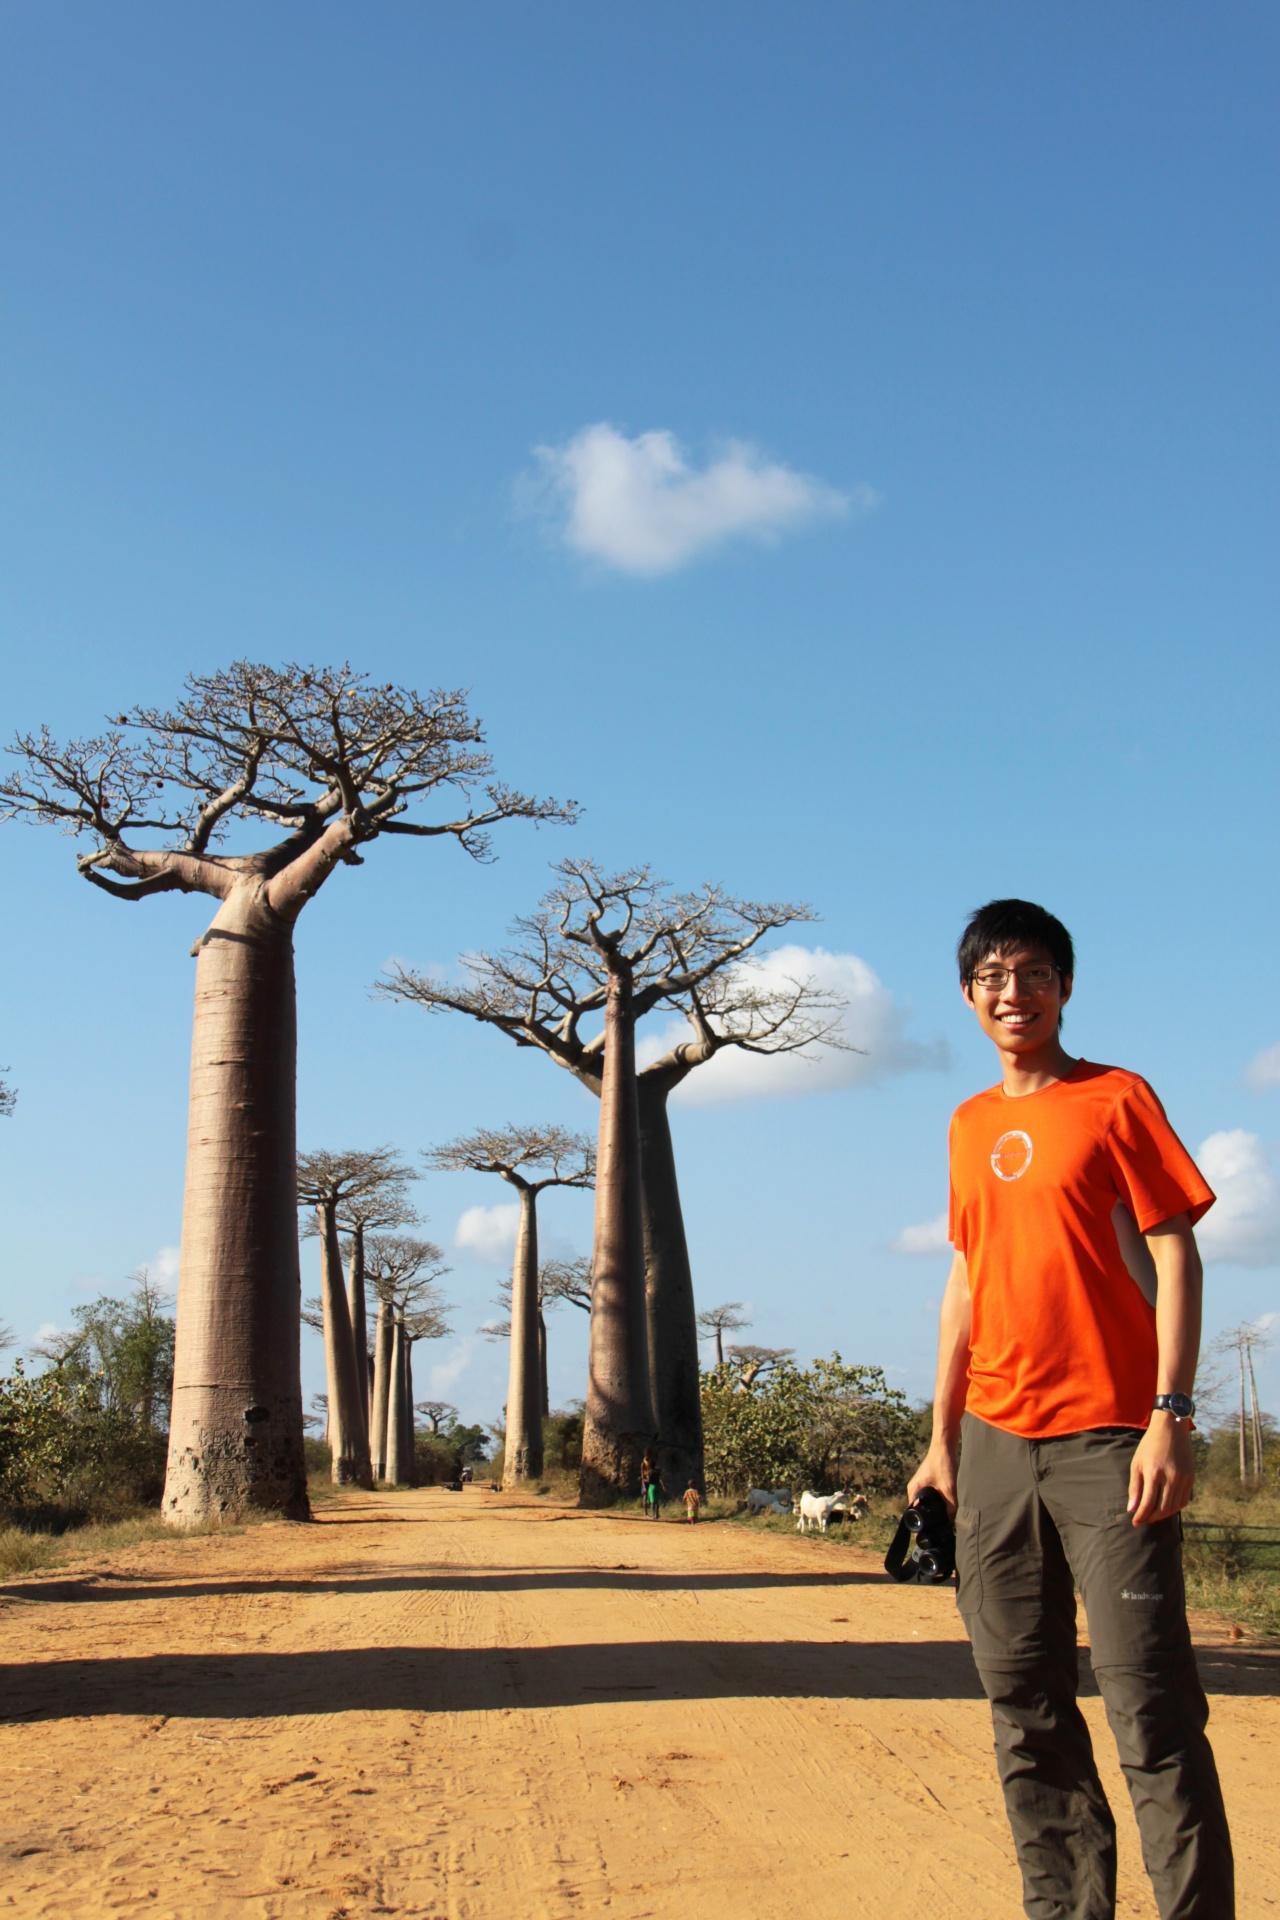 Xoni 於2011年協助帶領大學生生態考察,到訪非洲馬達加斯加。圖為著名的猴麵包樹大道和列為瀕危物種的Grandidier's Baobab。(受訪者提供)